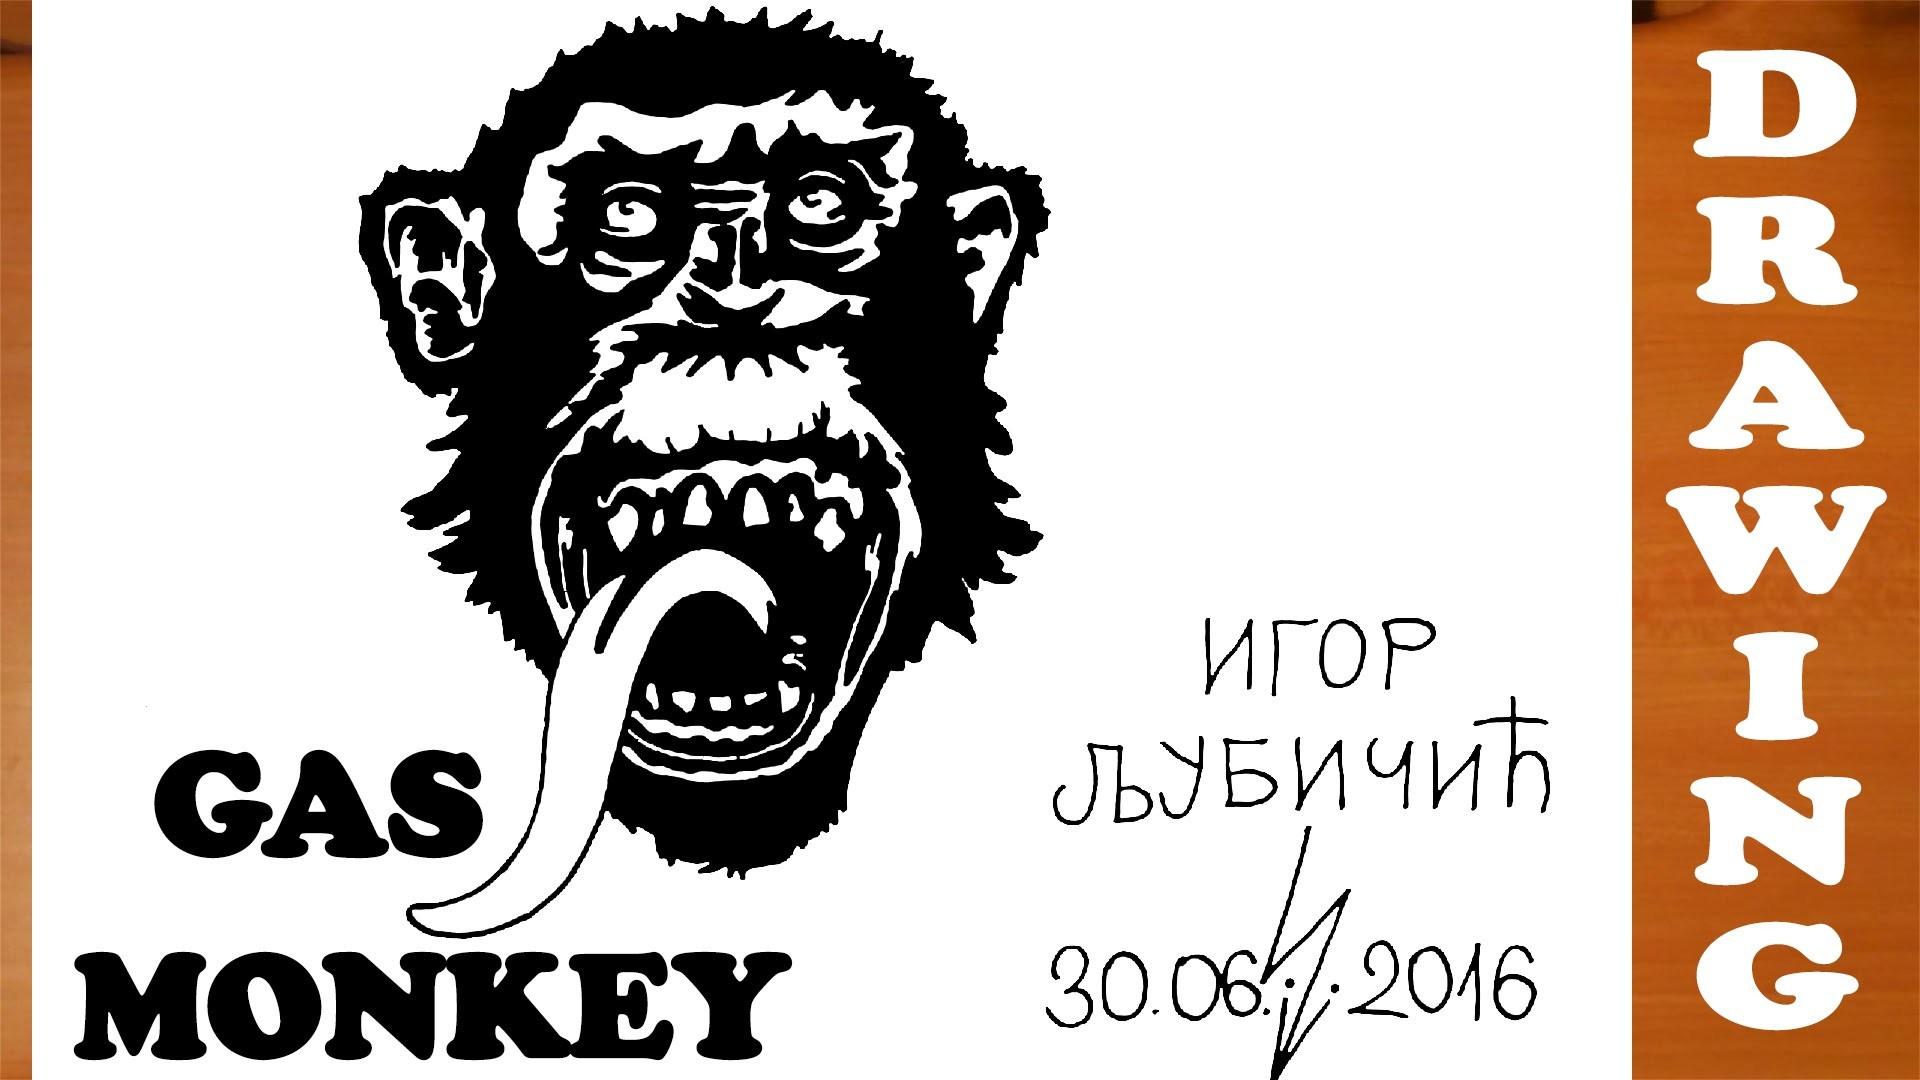 How to Draw a Chimpanzee Monkey Easy for Kids and color – Gas Monkey Garage  Logo   #MrUsegoodART – YouTube